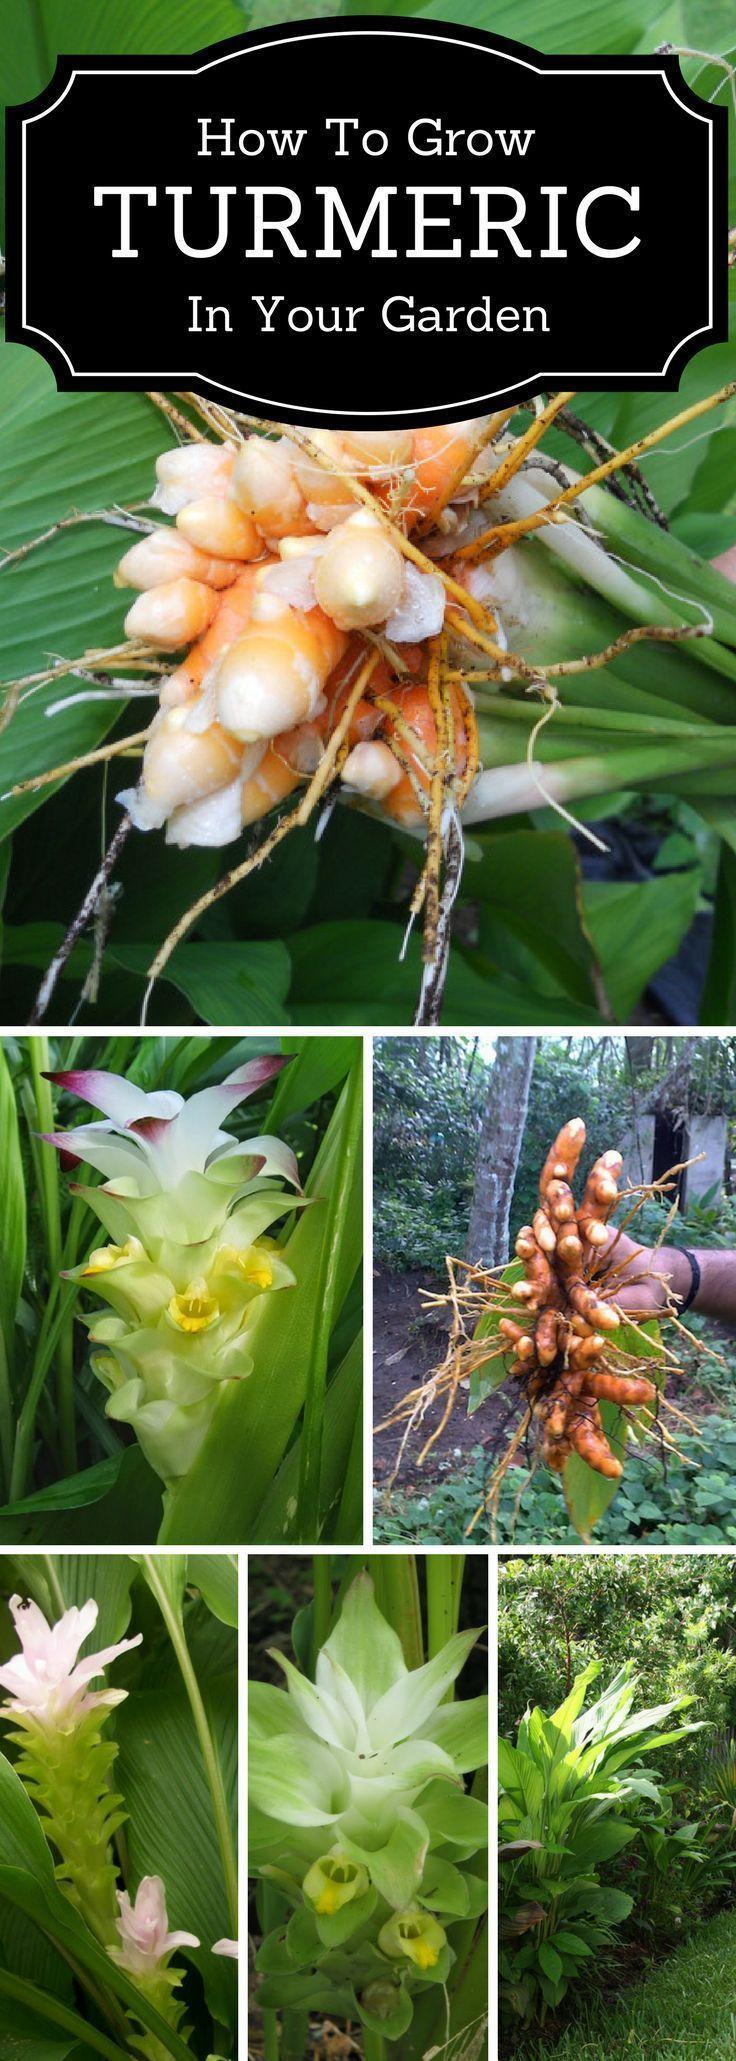 How to grow turmeric in the garden #OrganicGardening